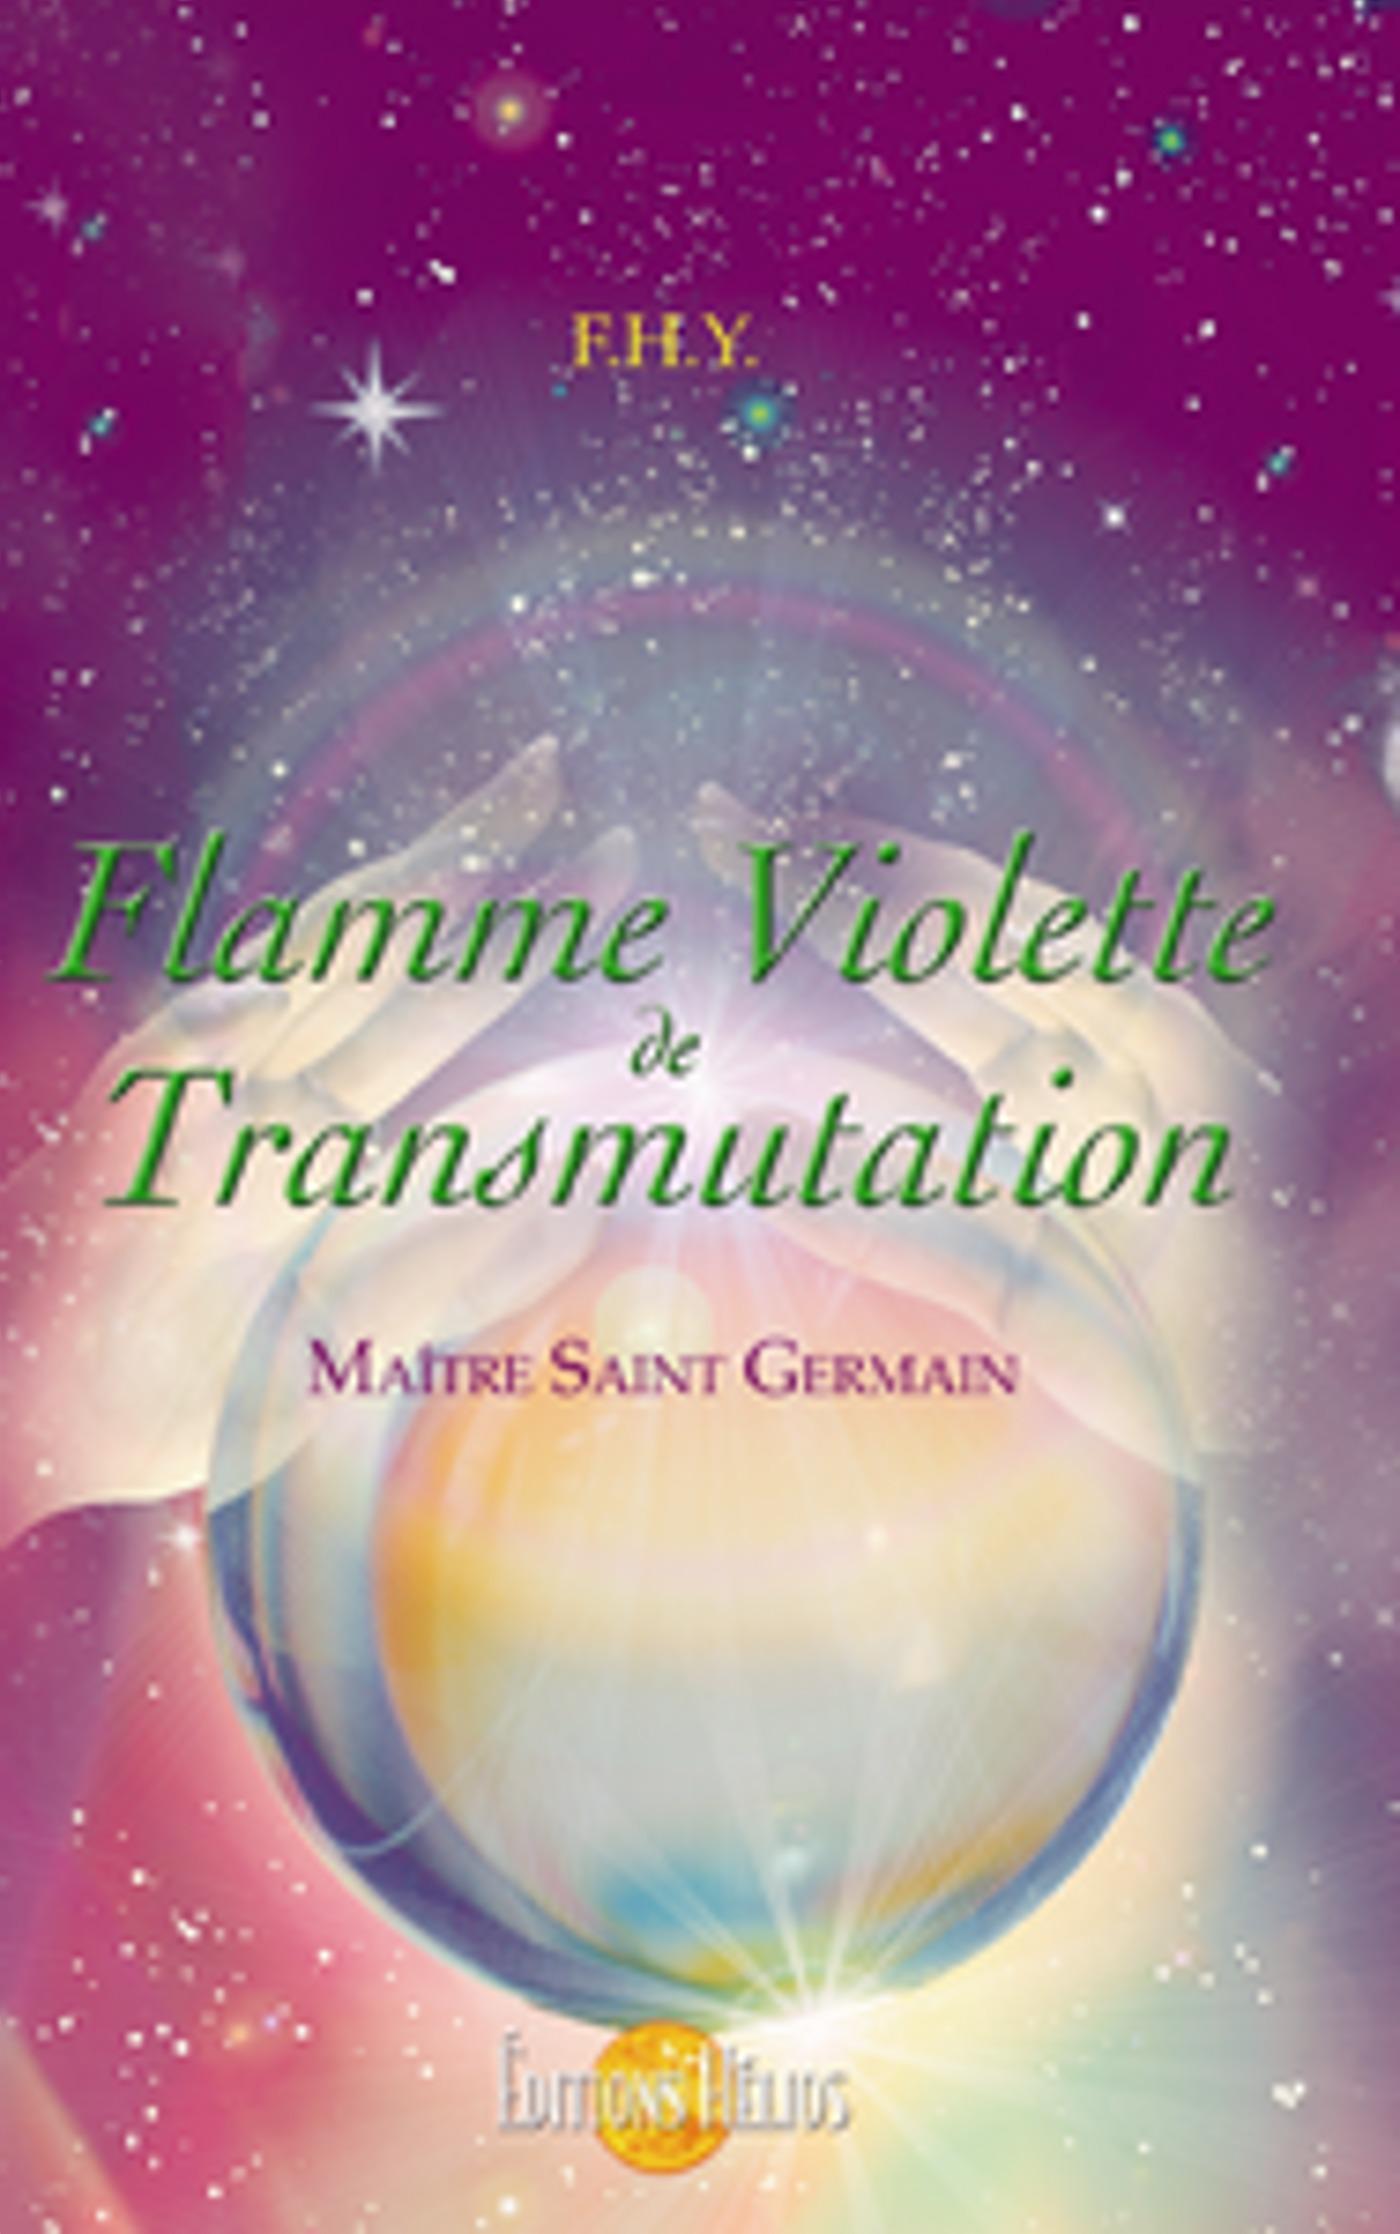 Flamme violette de transmutation